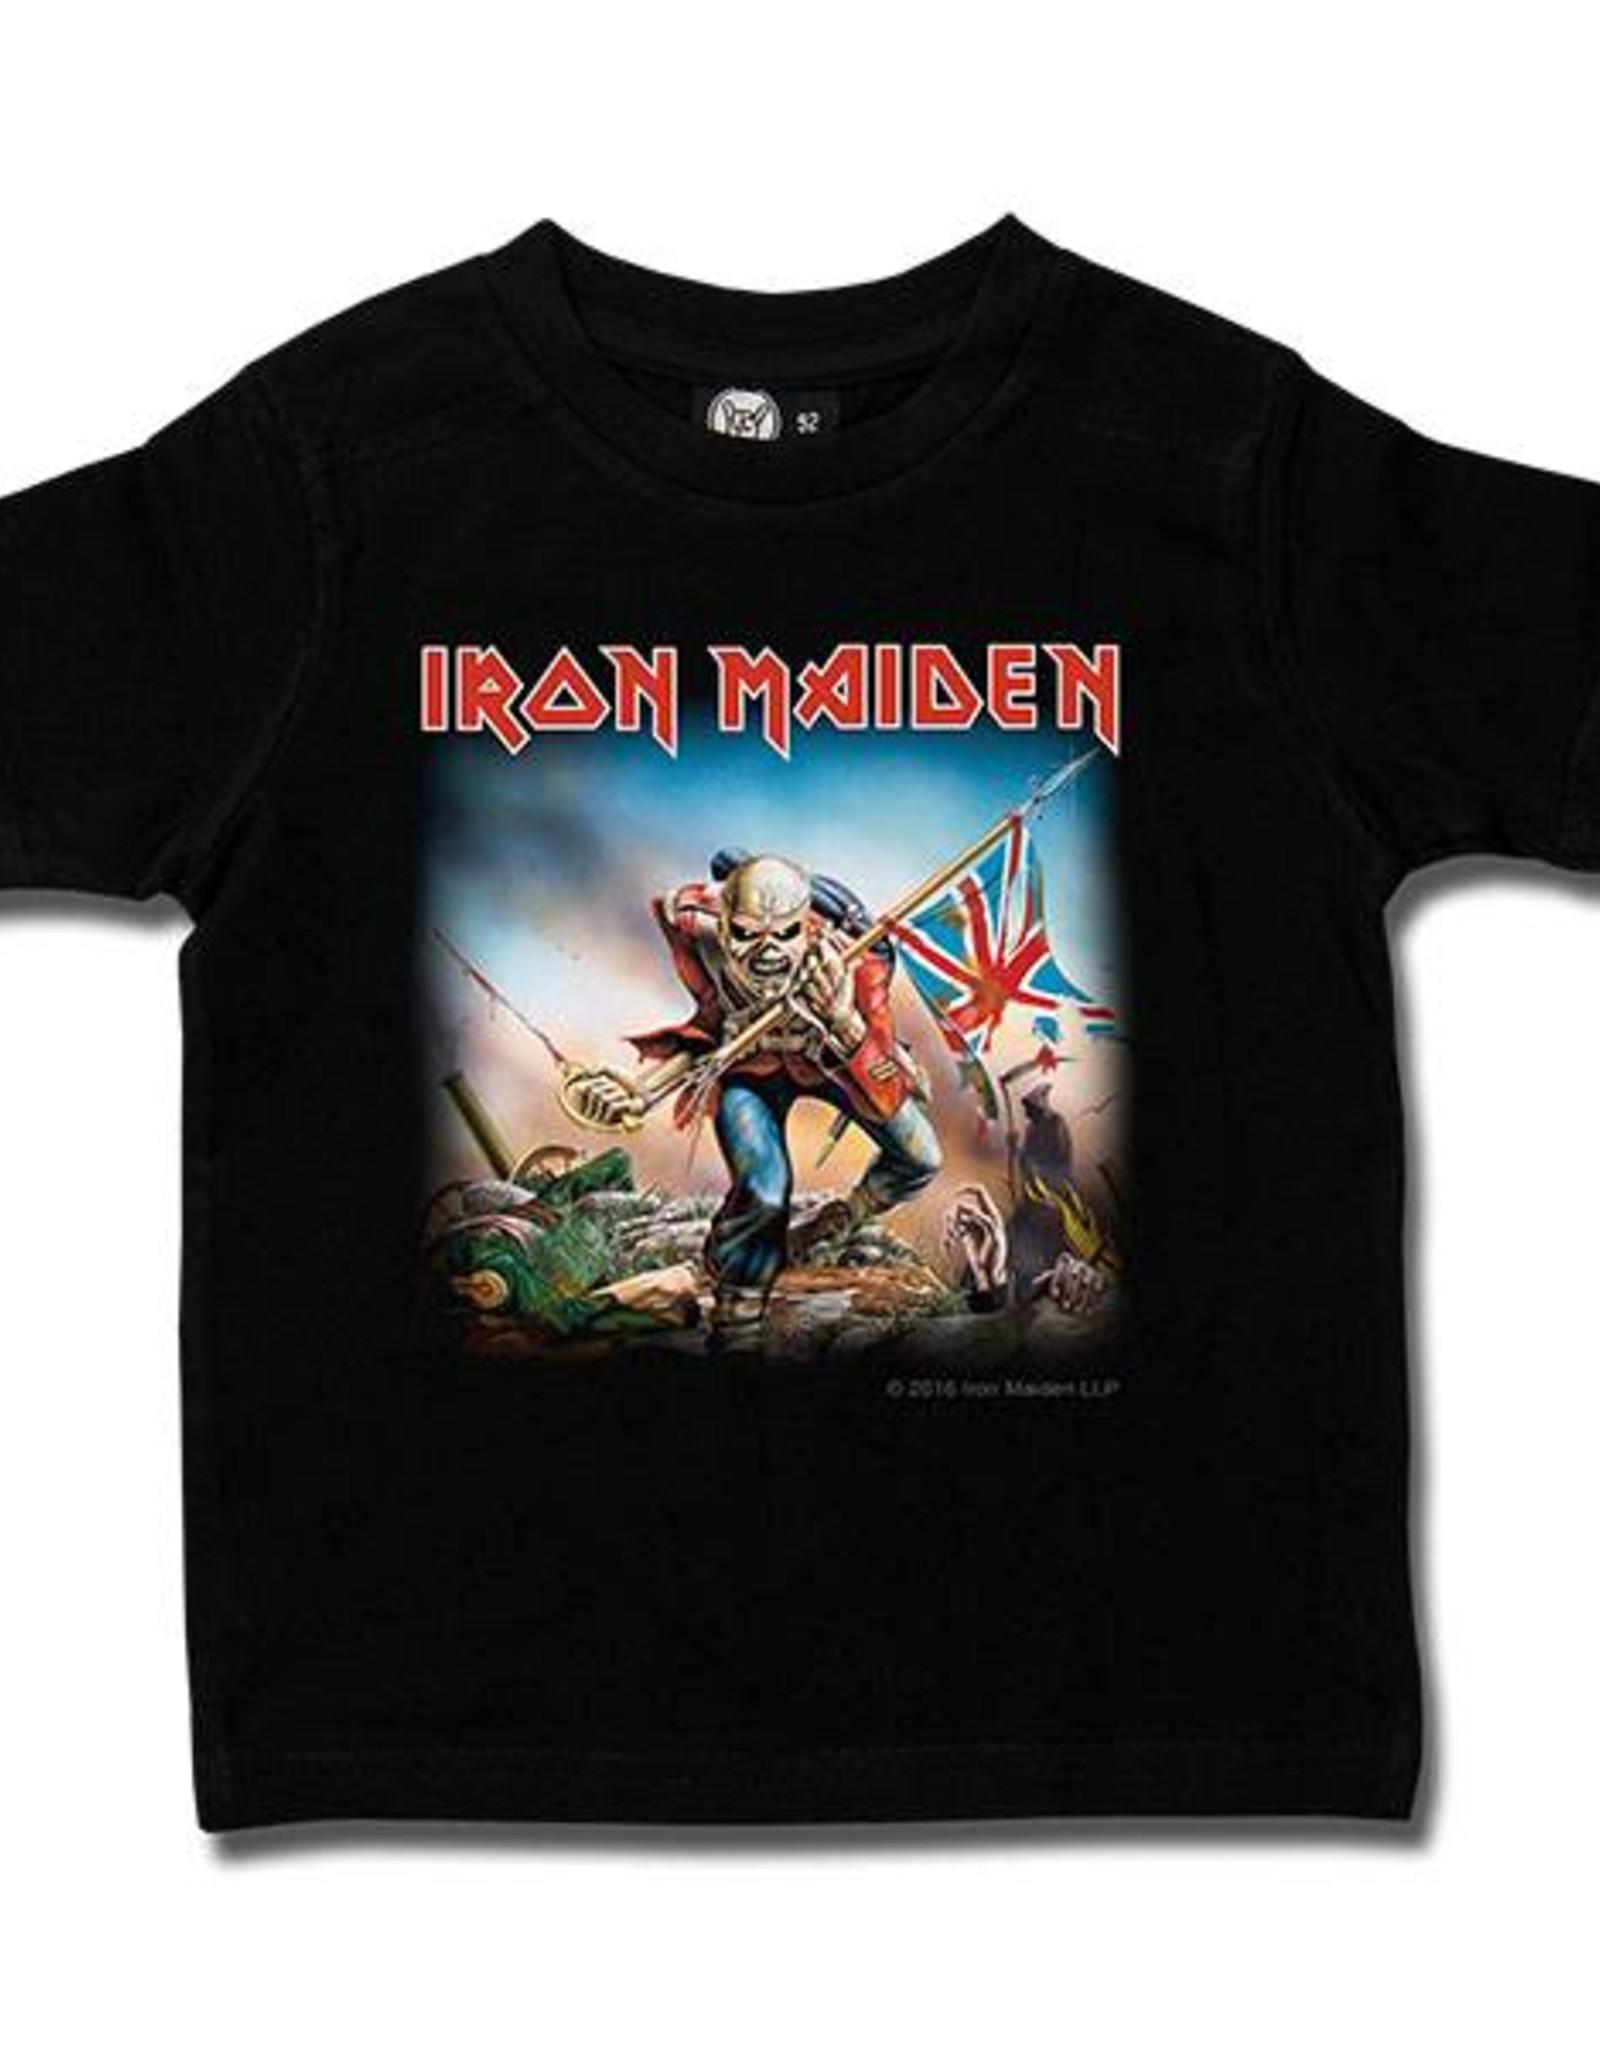 Iron Maiden (Trooper) - Kids T-Shirt